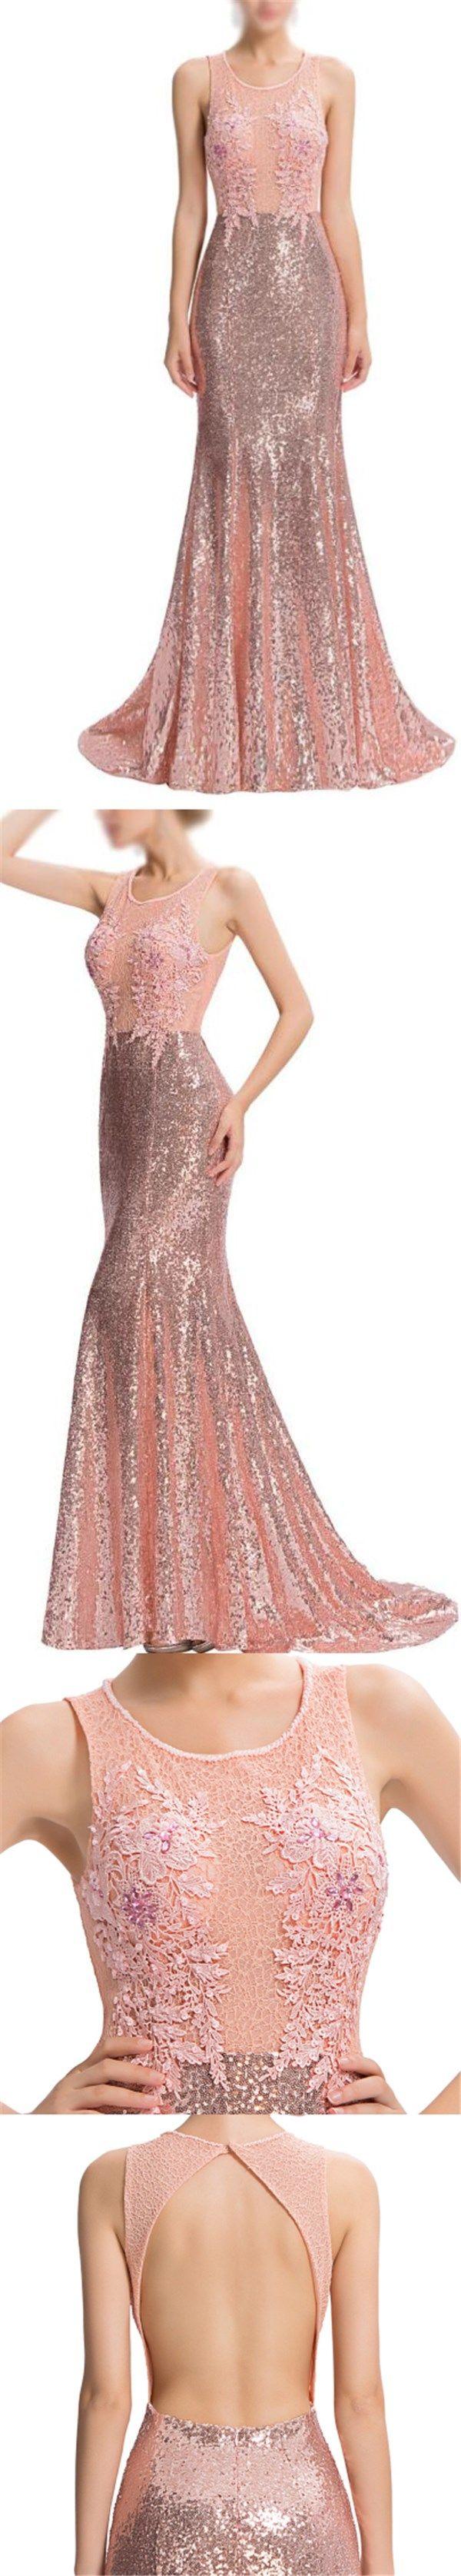 best prom dresses images on pinterest long prom dresses